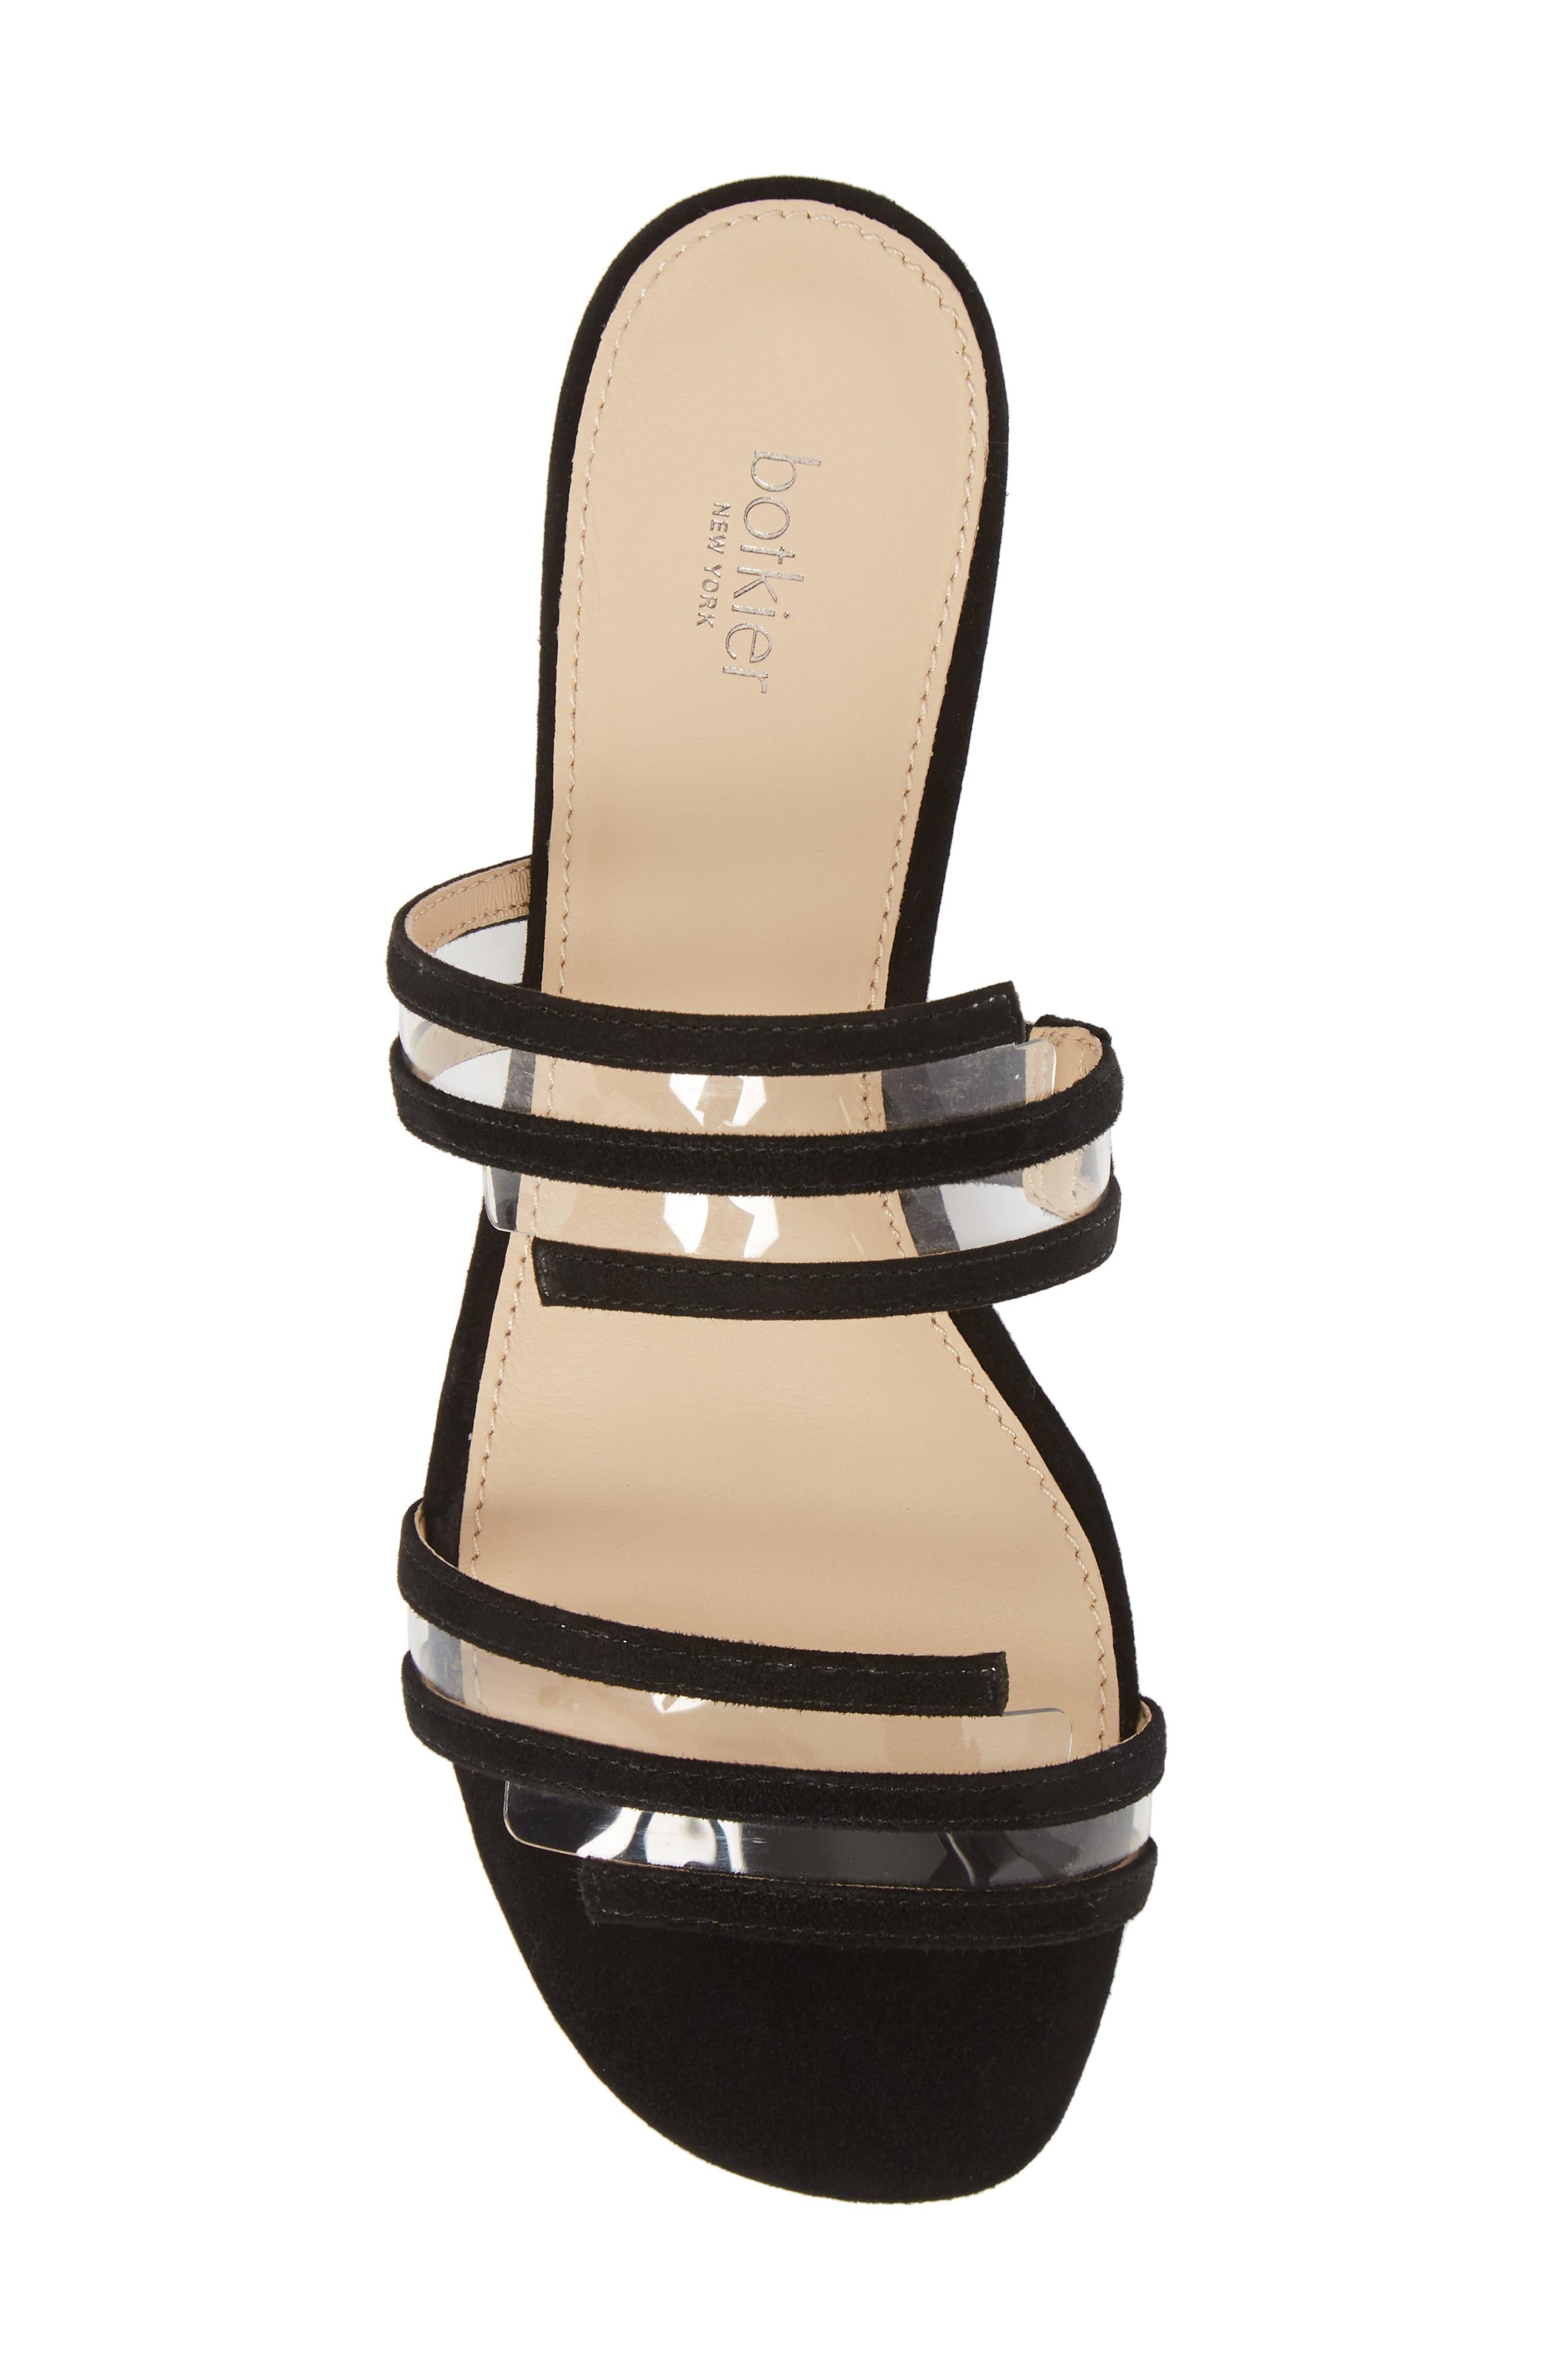 Maise Slide Sandal,                             Alternate thumbnail 5, color,                             BLACK SUEDE